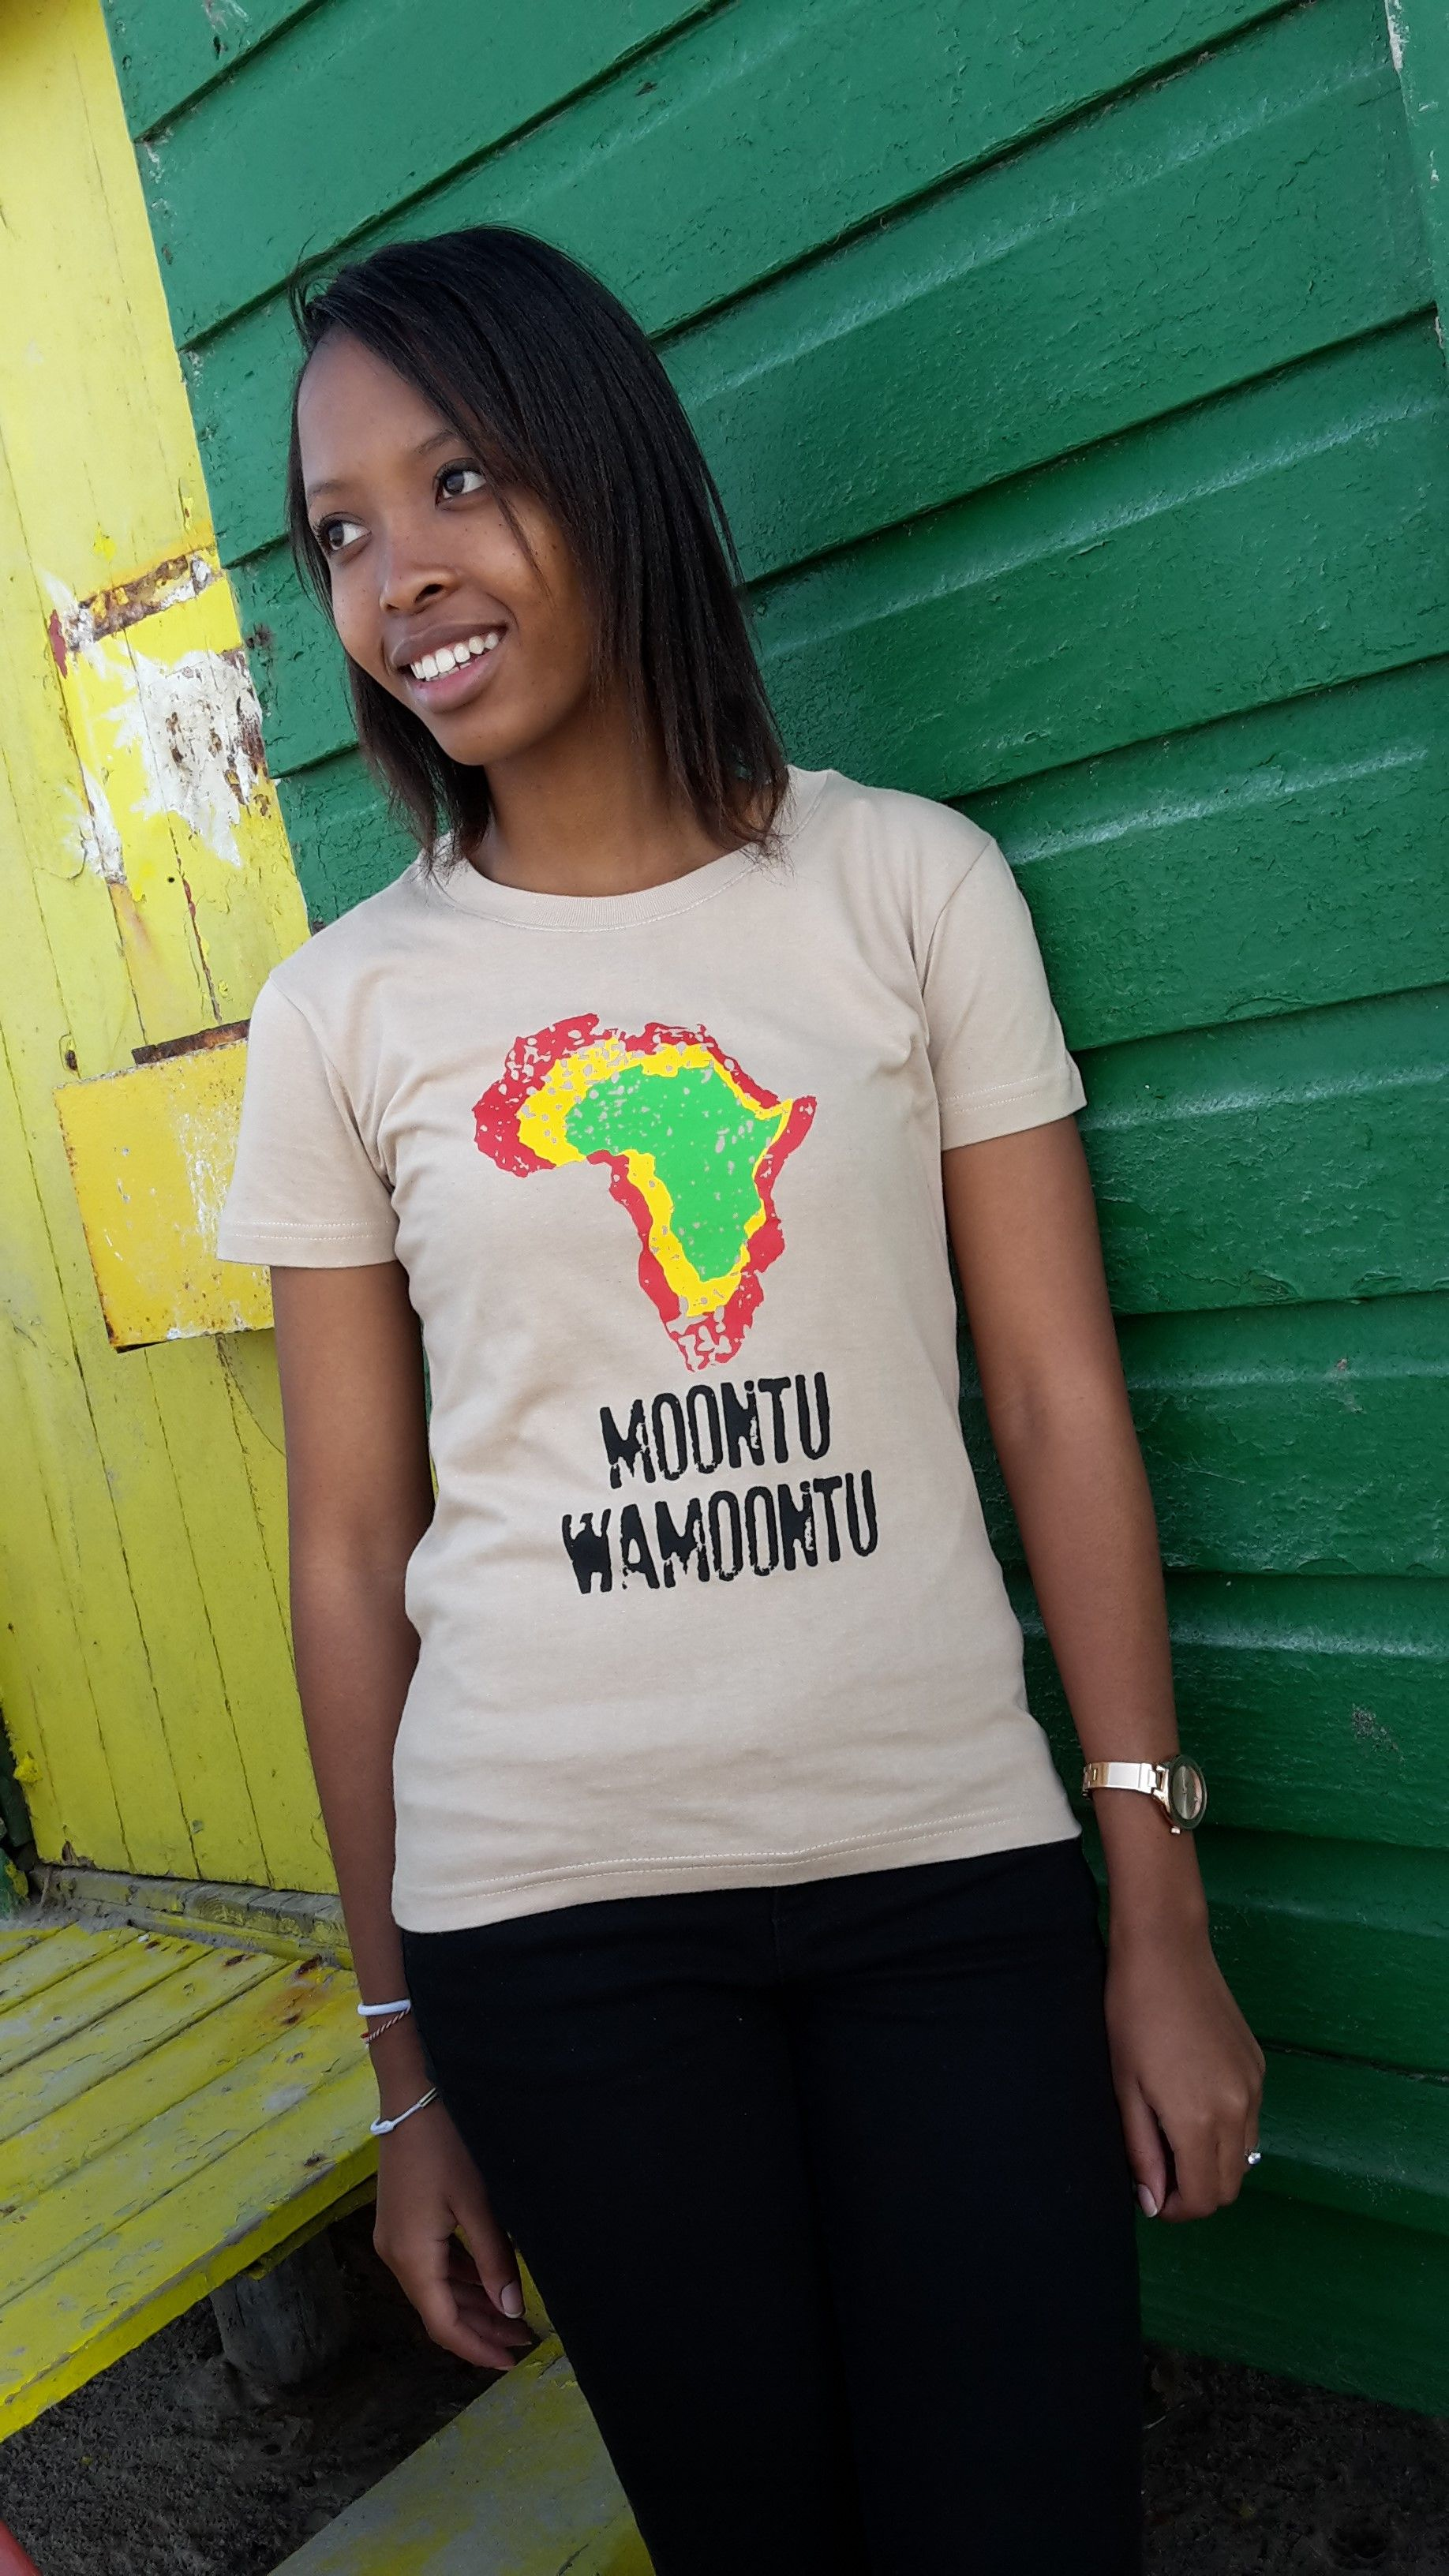 The Moontu WaMoontu Afrique (ladies) tee